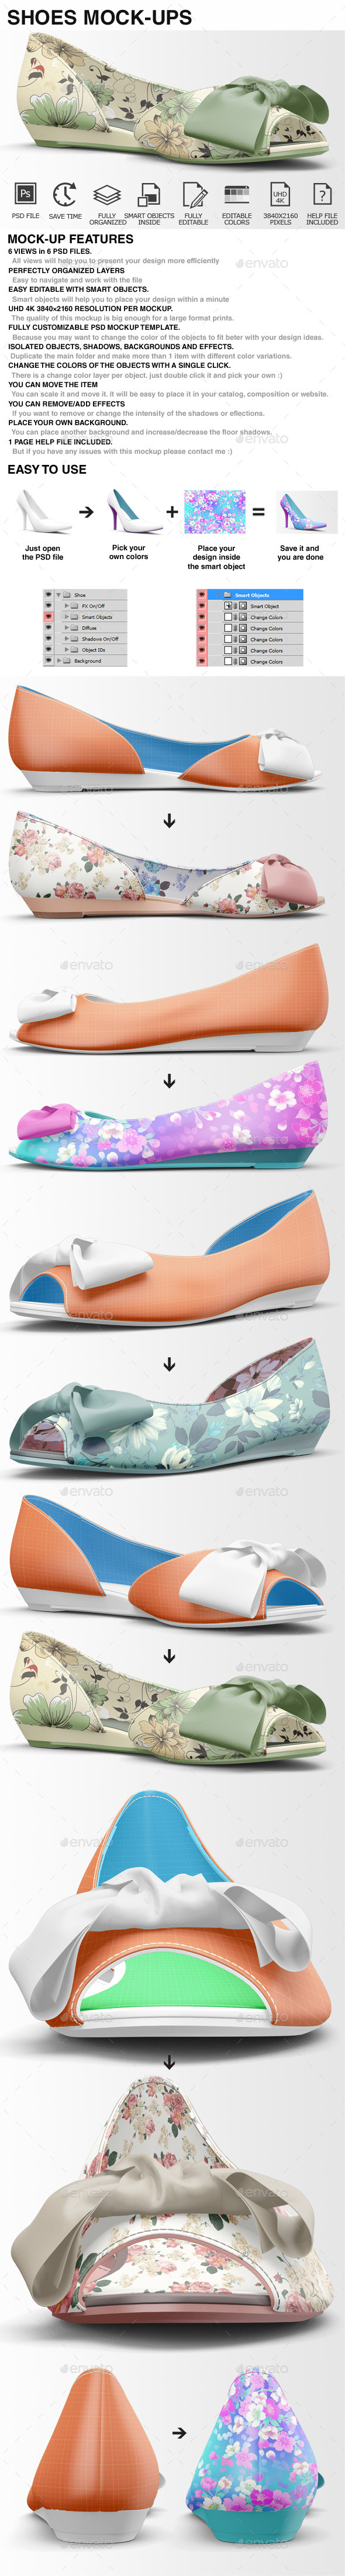 Shoes Mockup - Woman Shoes Mockups Vol 3 - Miscellaneous Apparel